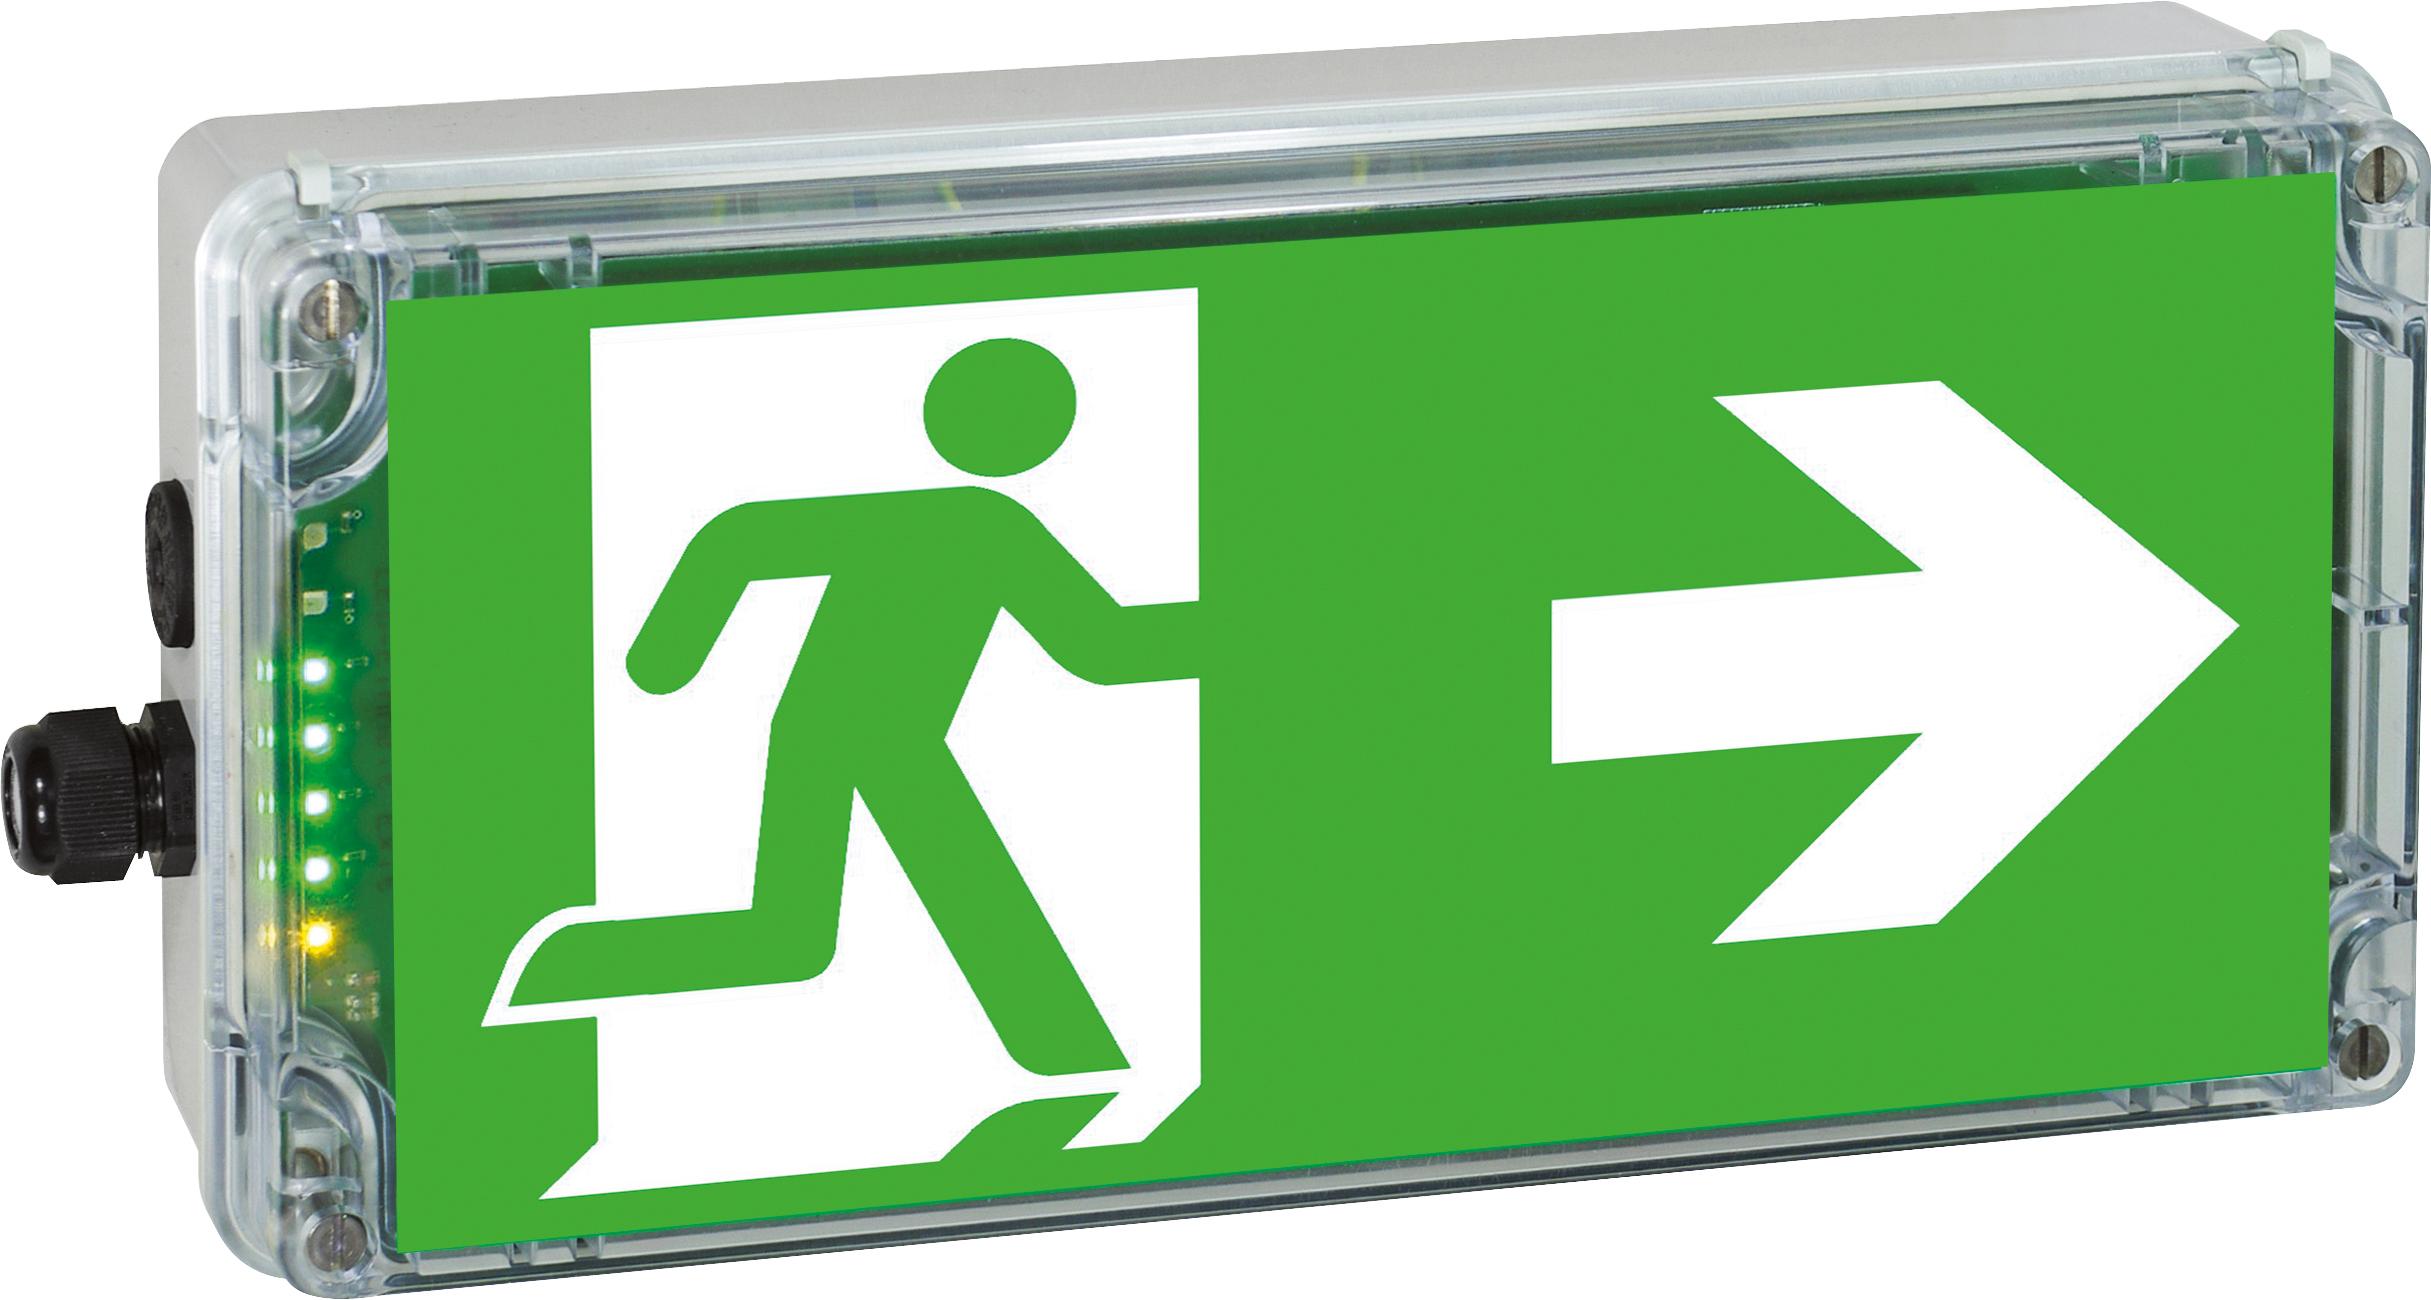 Ex-Notleuchte EXIT 2 N Zone 2/22 LED 3h 230V AC,Pfeil rechts